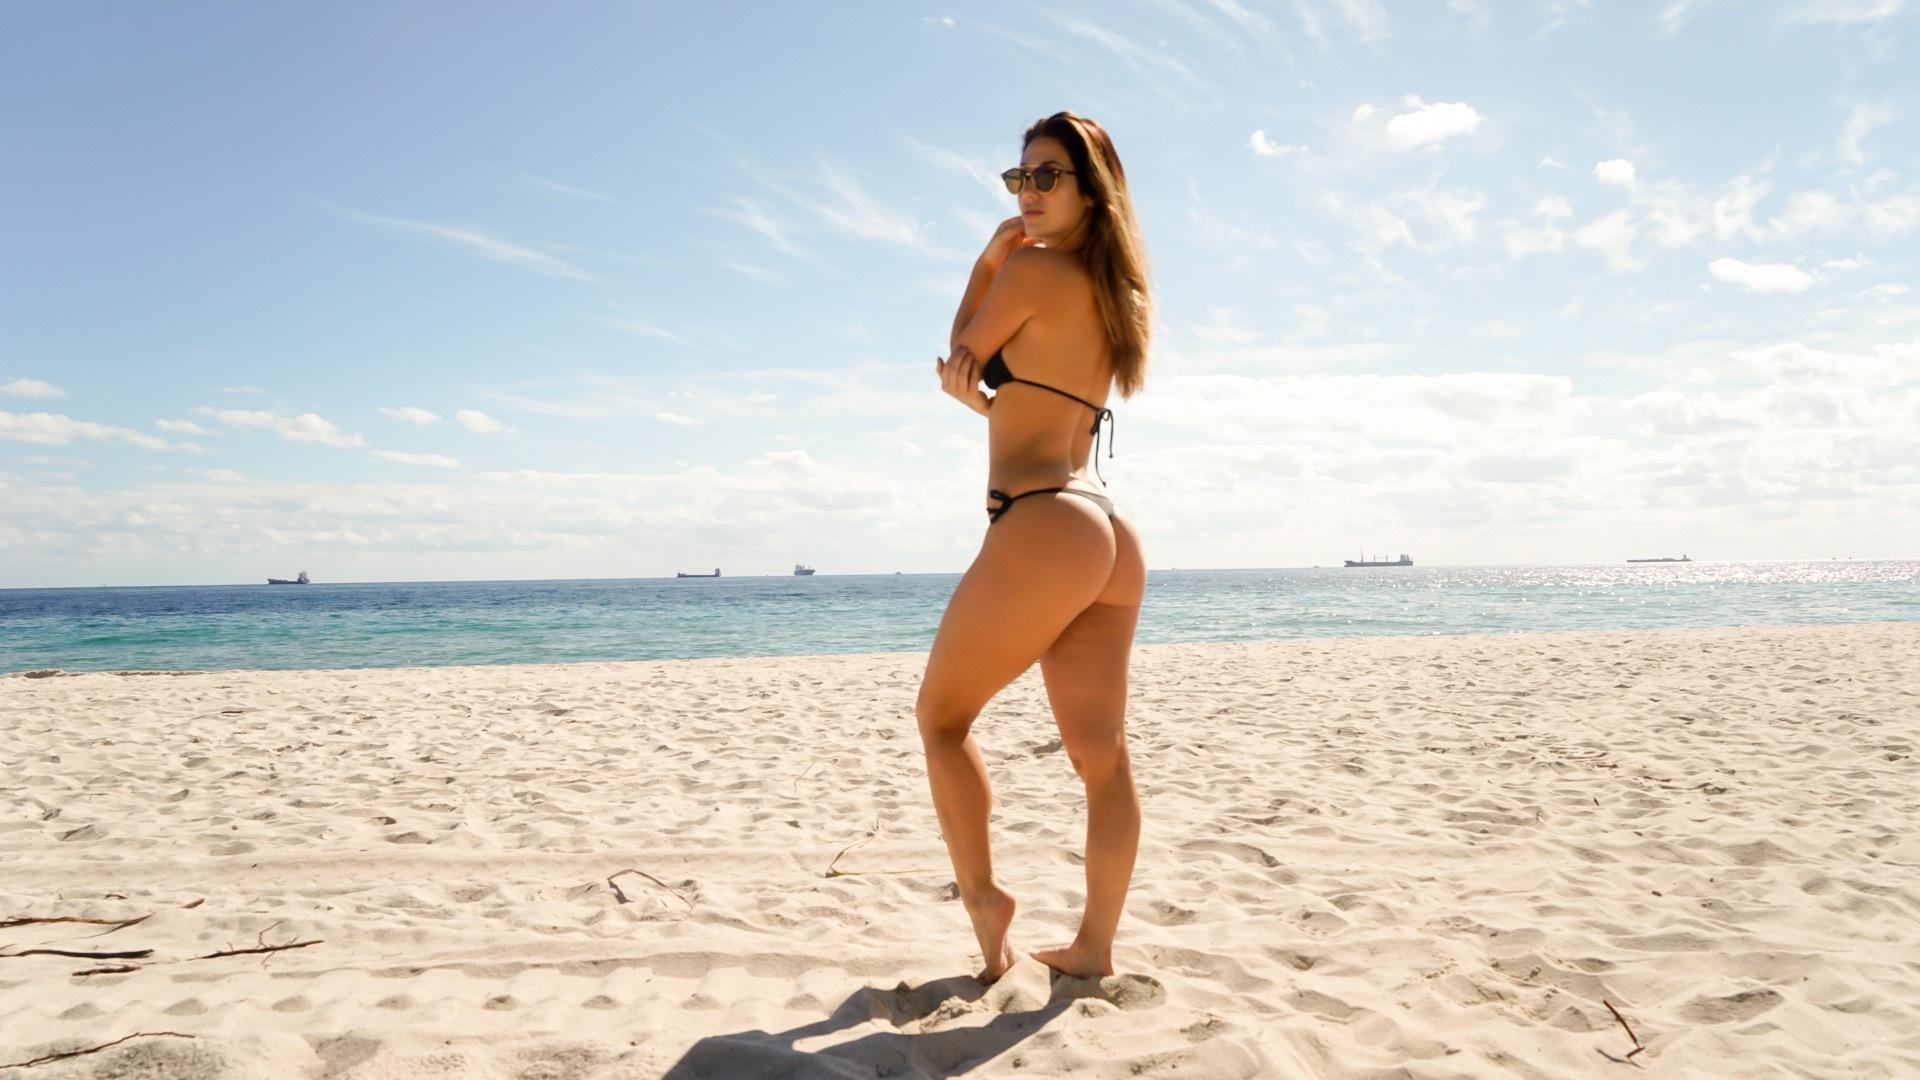 miami beach booty